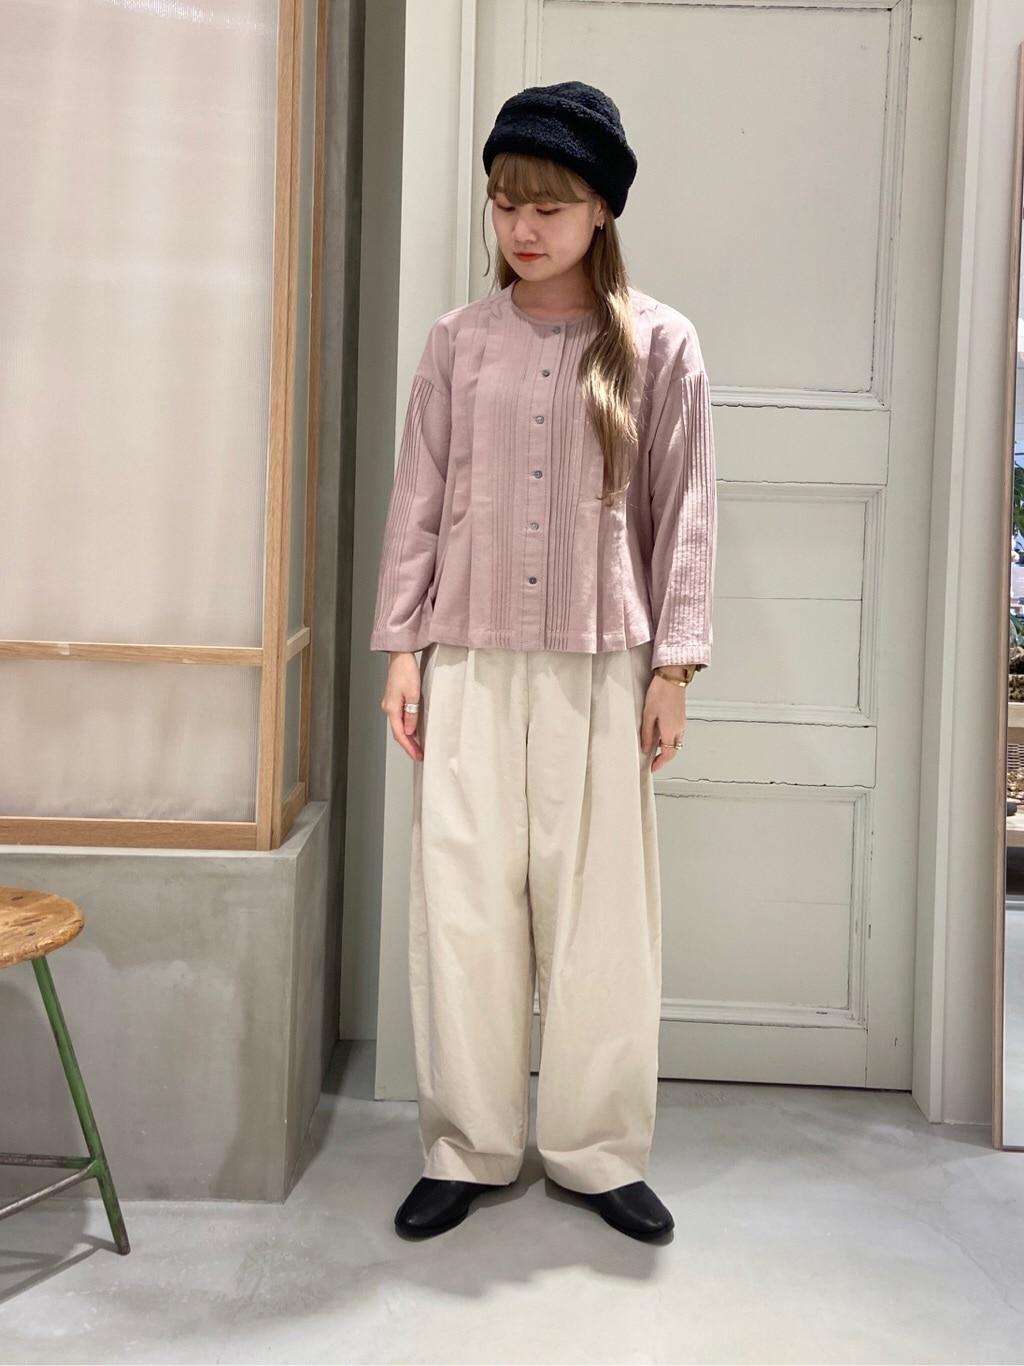 bulle de savon 渋谷スクランブルスクエア 身長:160cm 2020.10.05